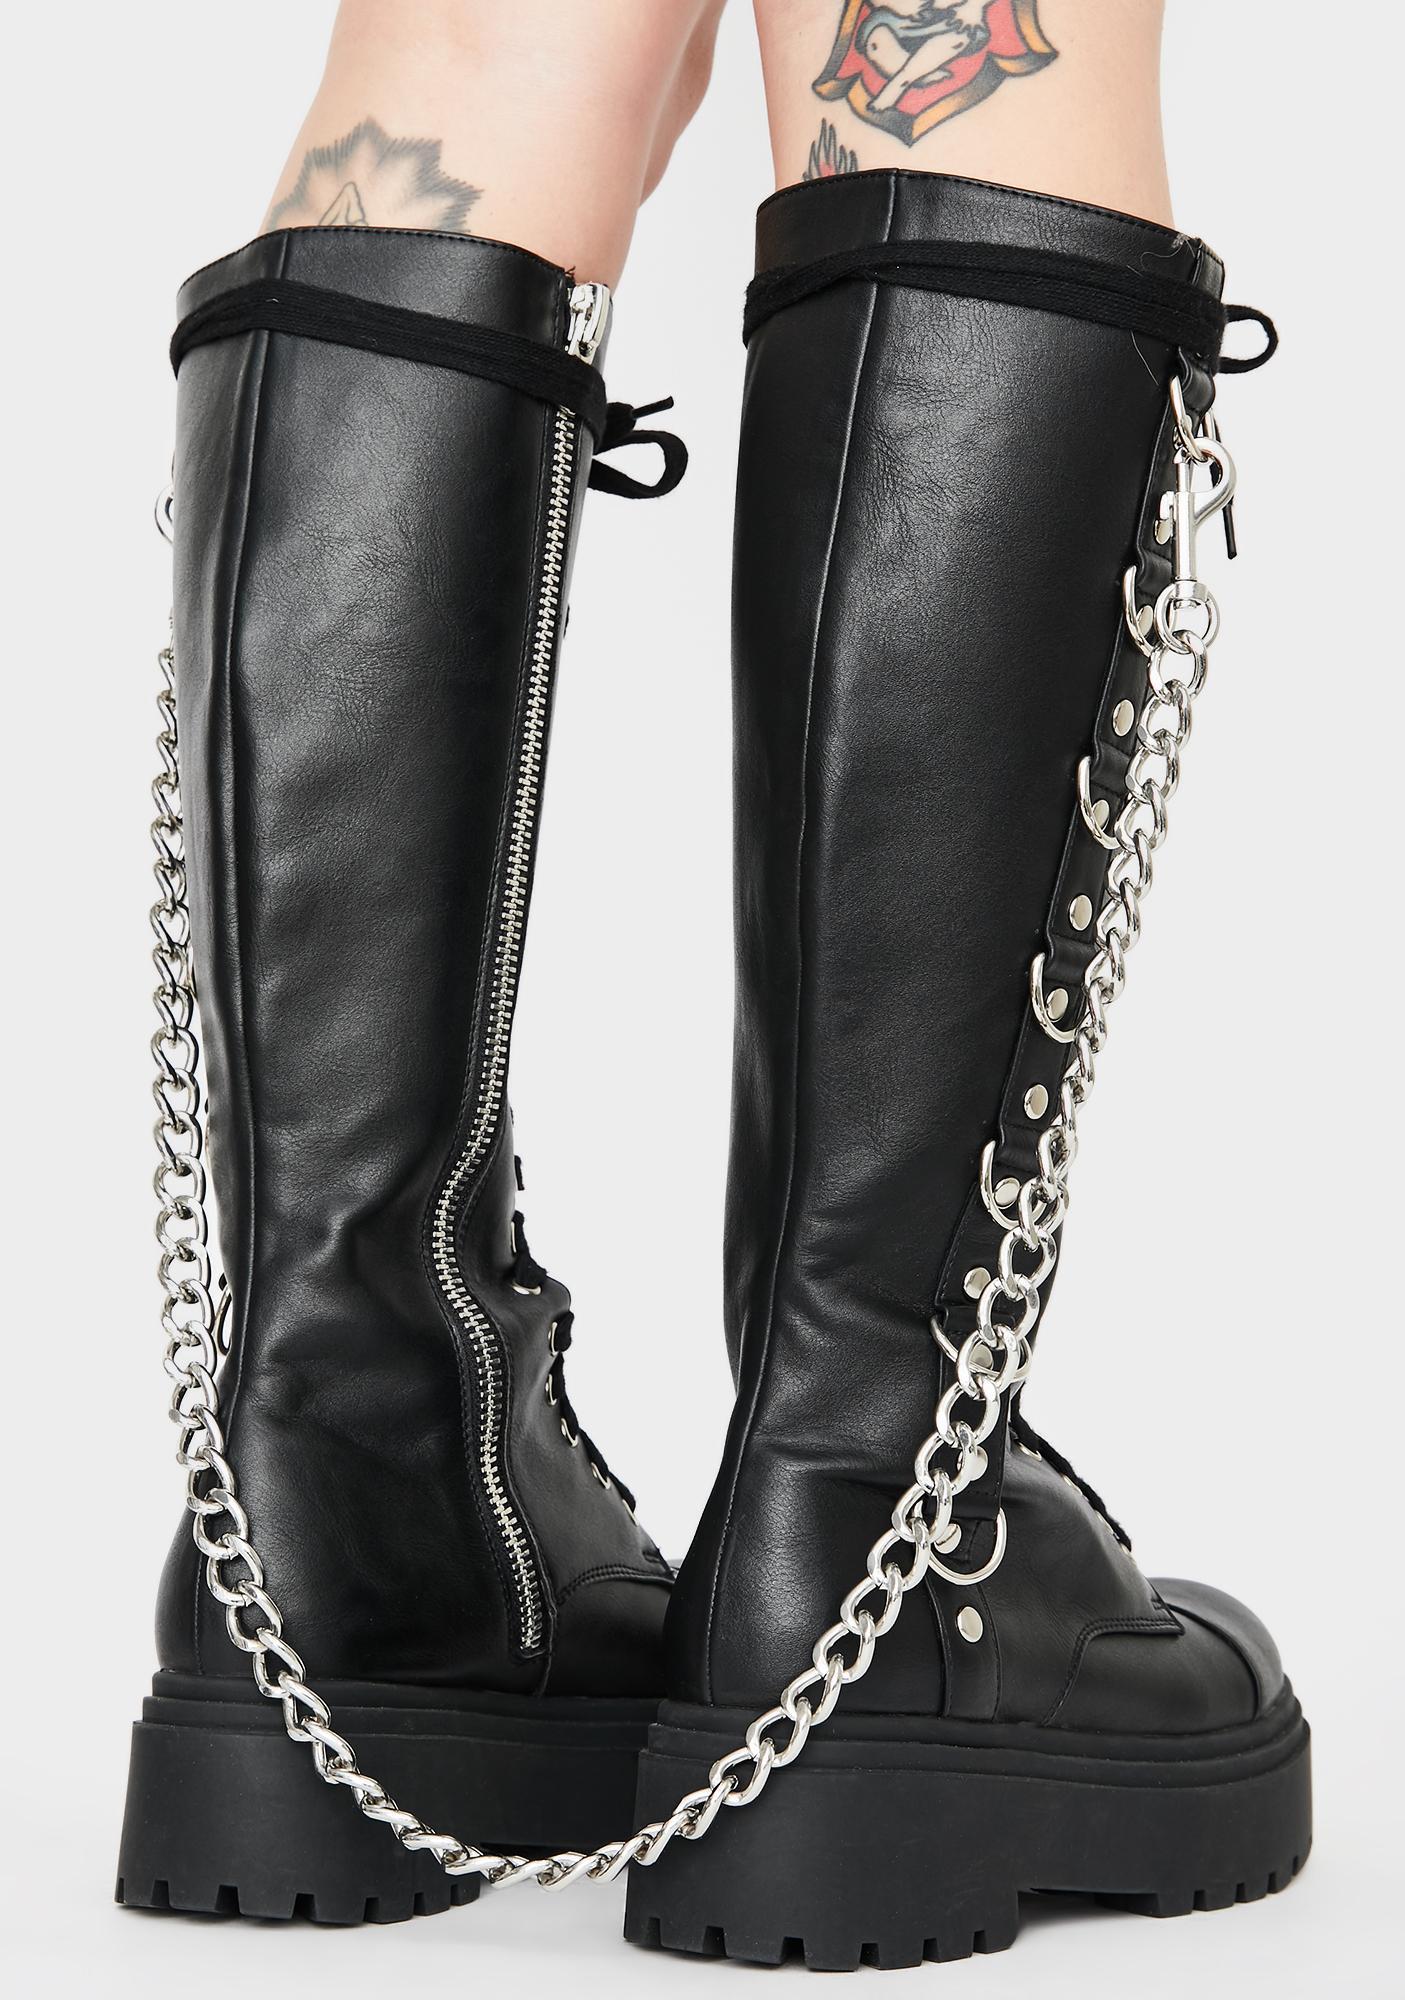 Widow Fright Night Knee High Boots